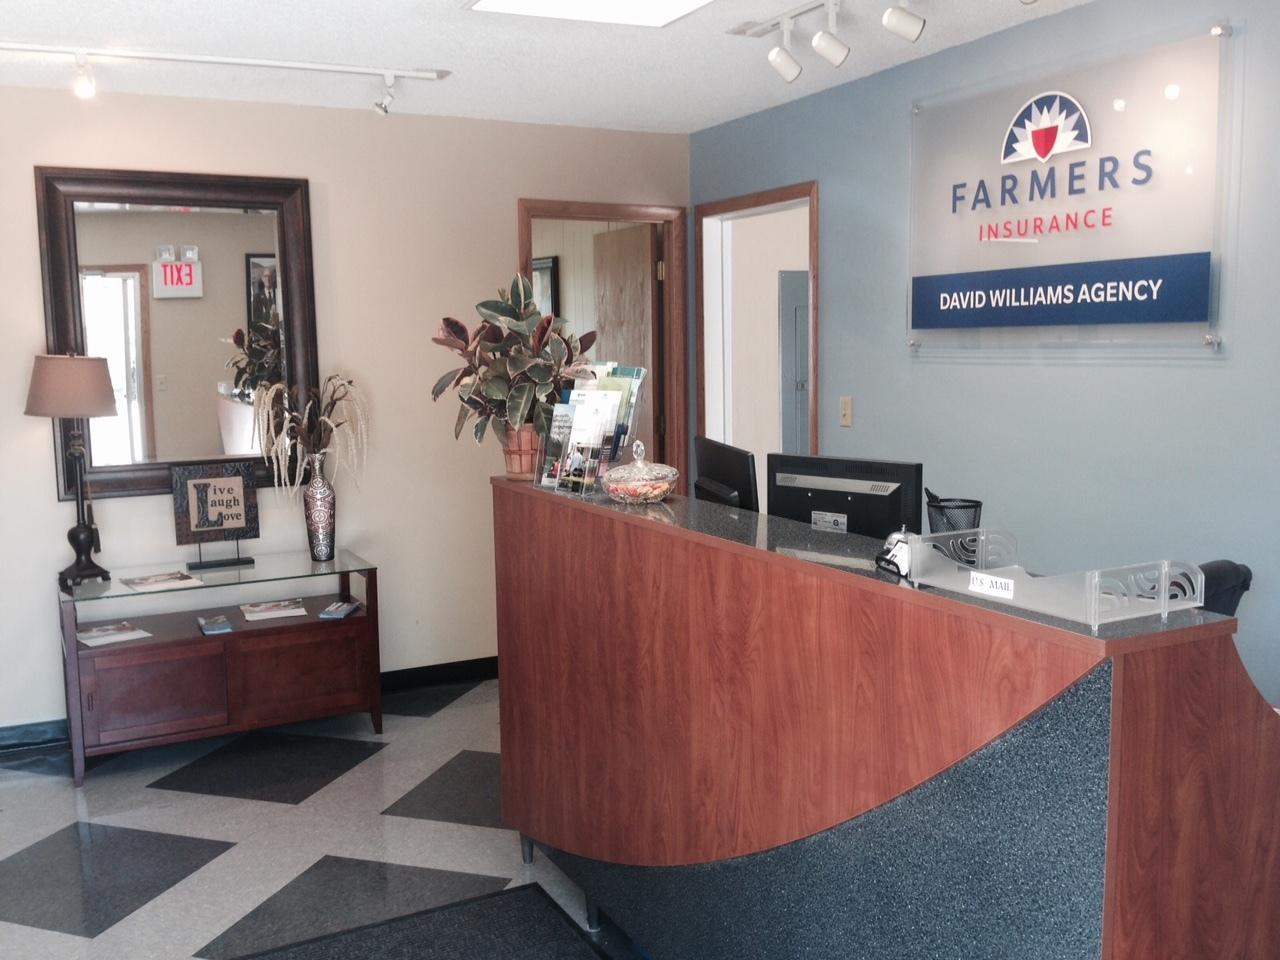 Farmers Insurance - David Williams image 5